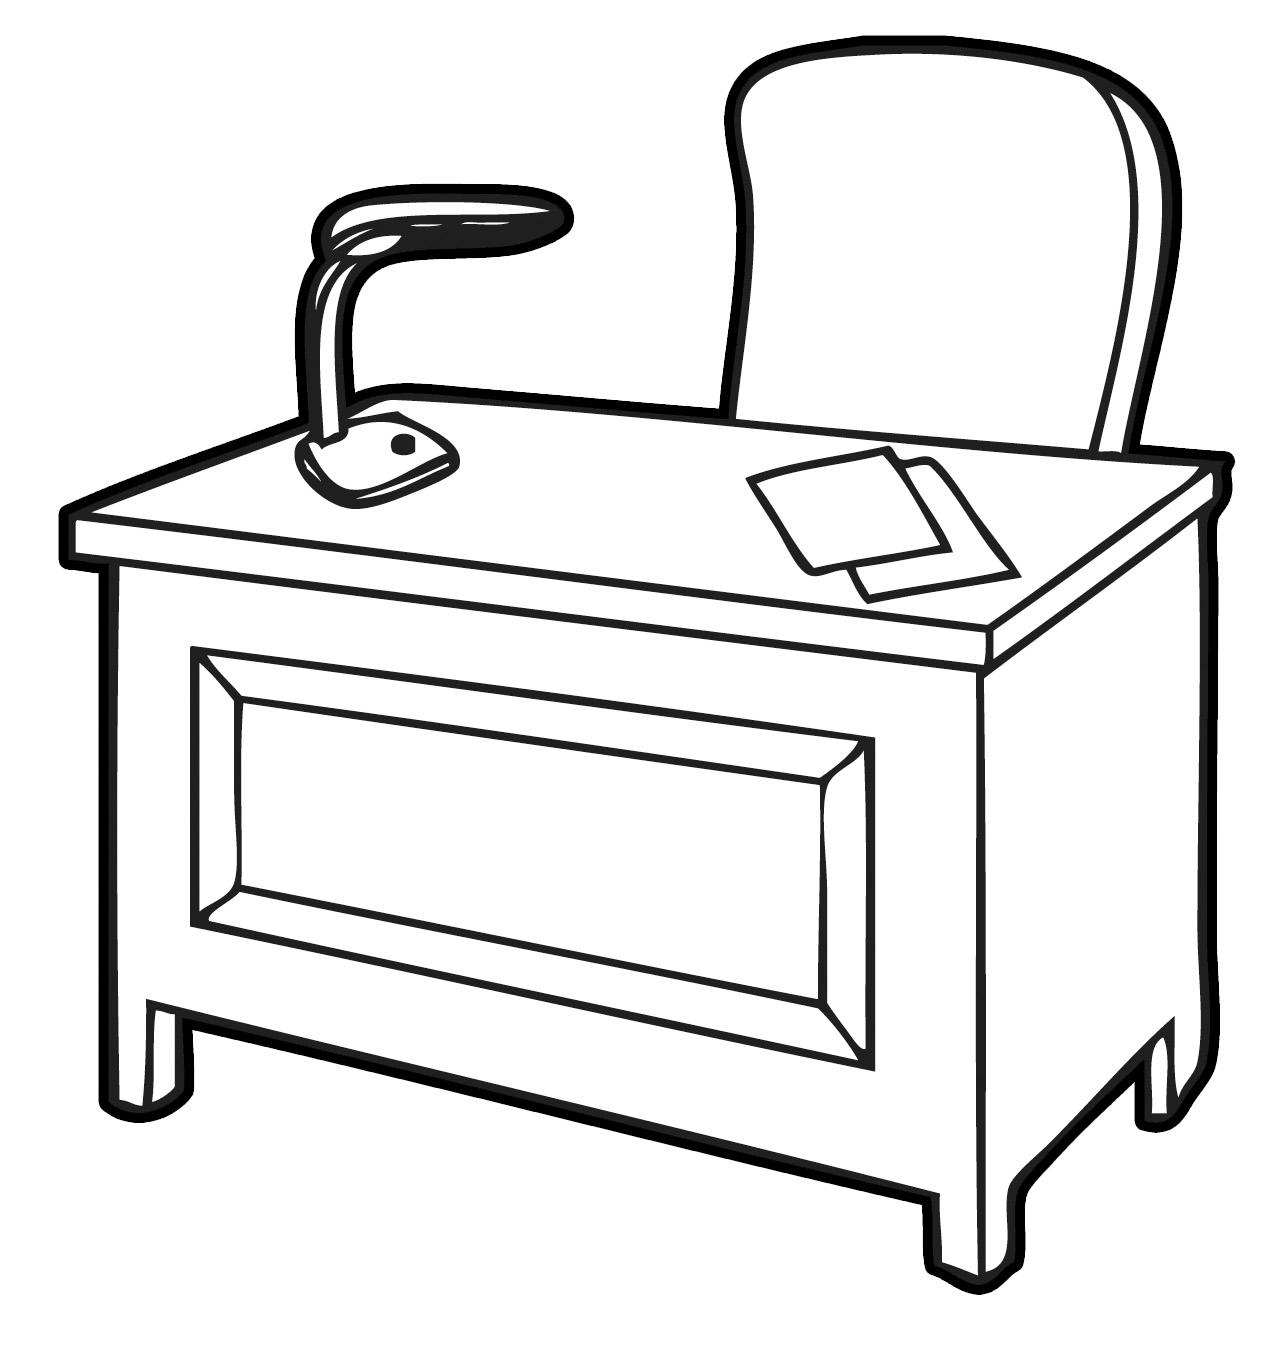 Scotch clipart office desk #2